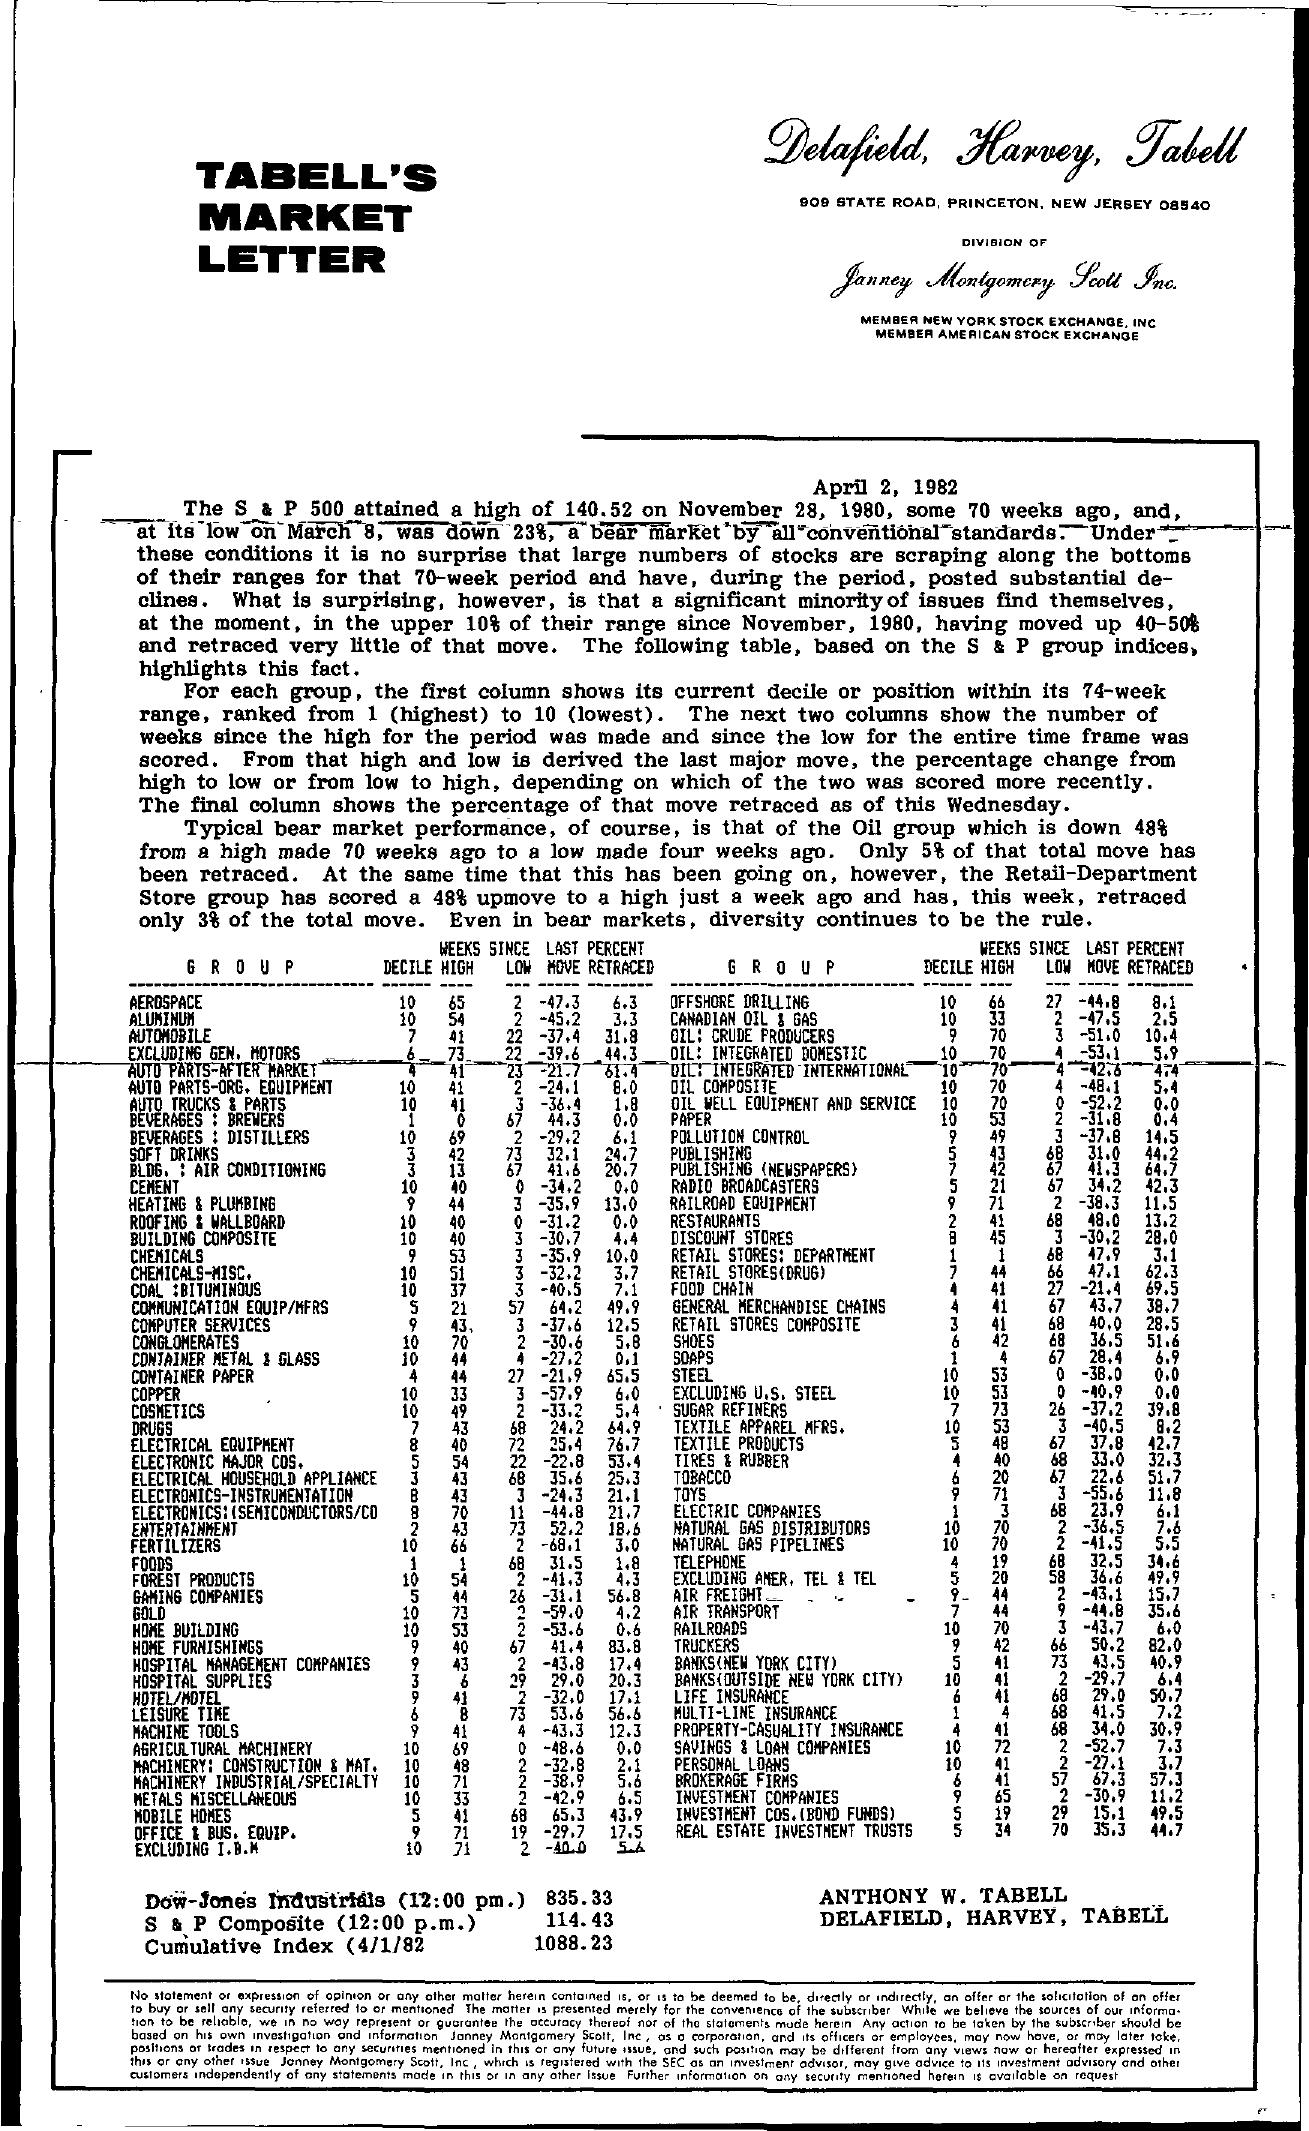 Tabell's Market Letter - April 02, 1982